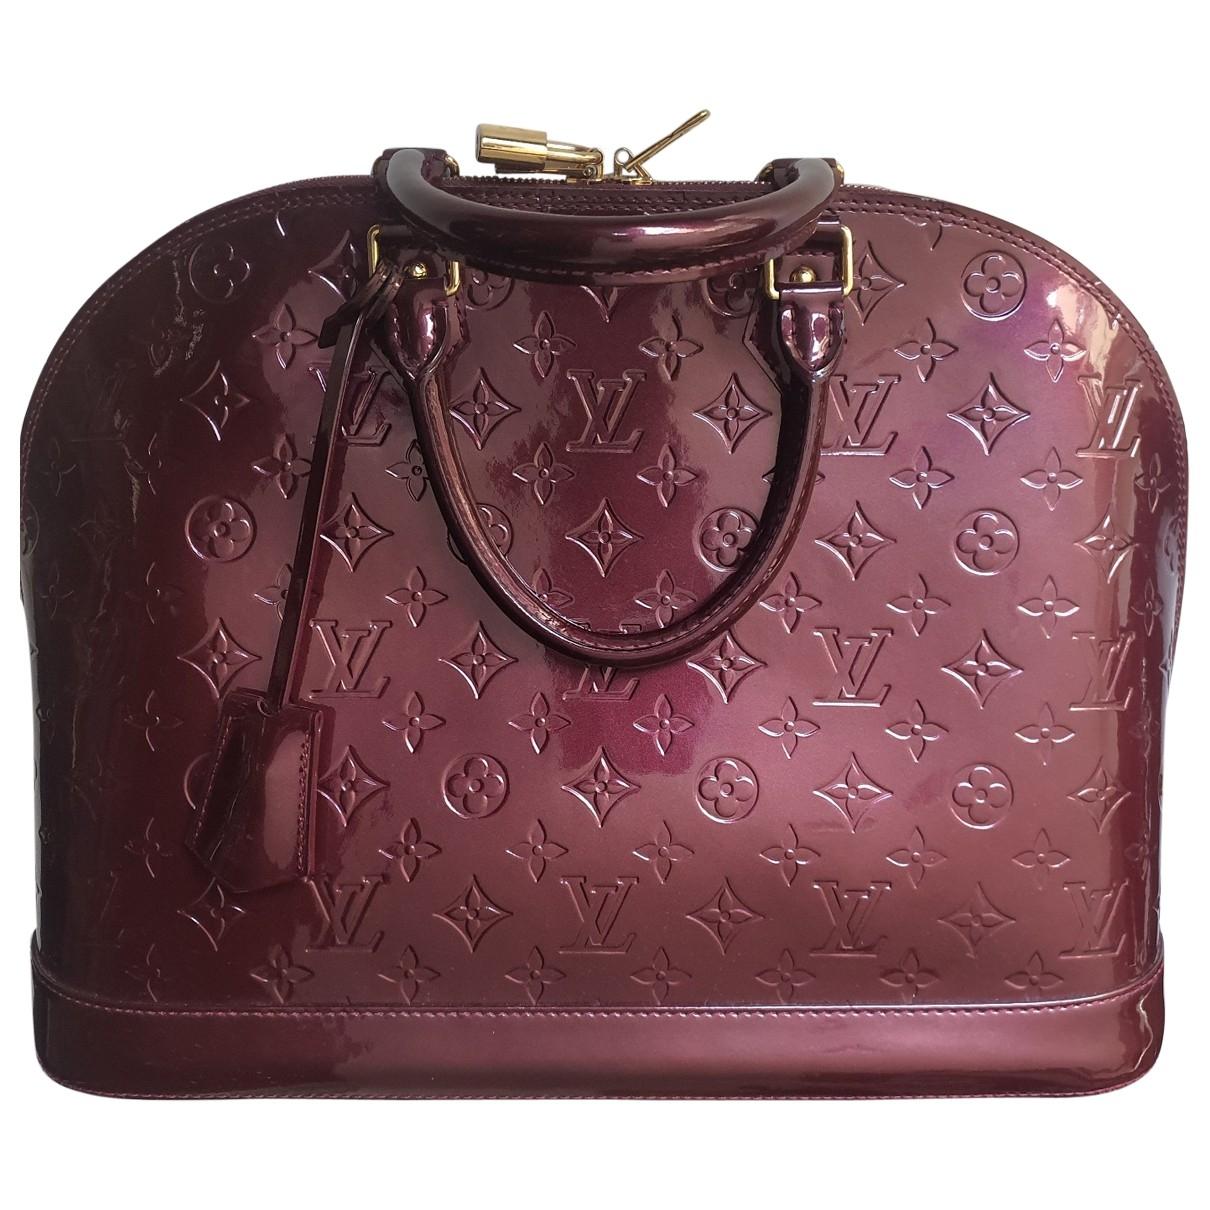 Louis Vuitton Alma Handtasche in  Lila Lackleder